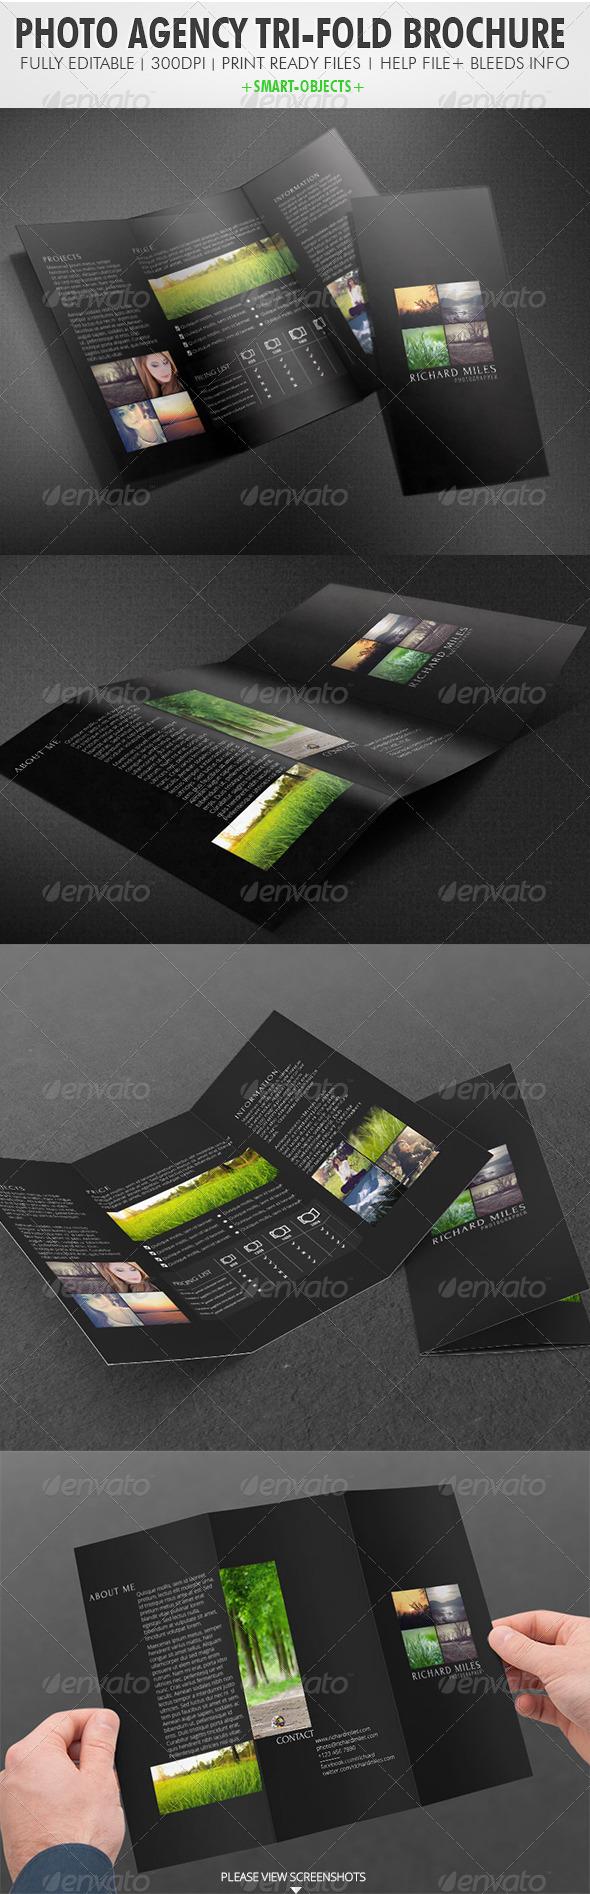 GraphicRiver Photo Agency Tri-fold Brochure 3966701